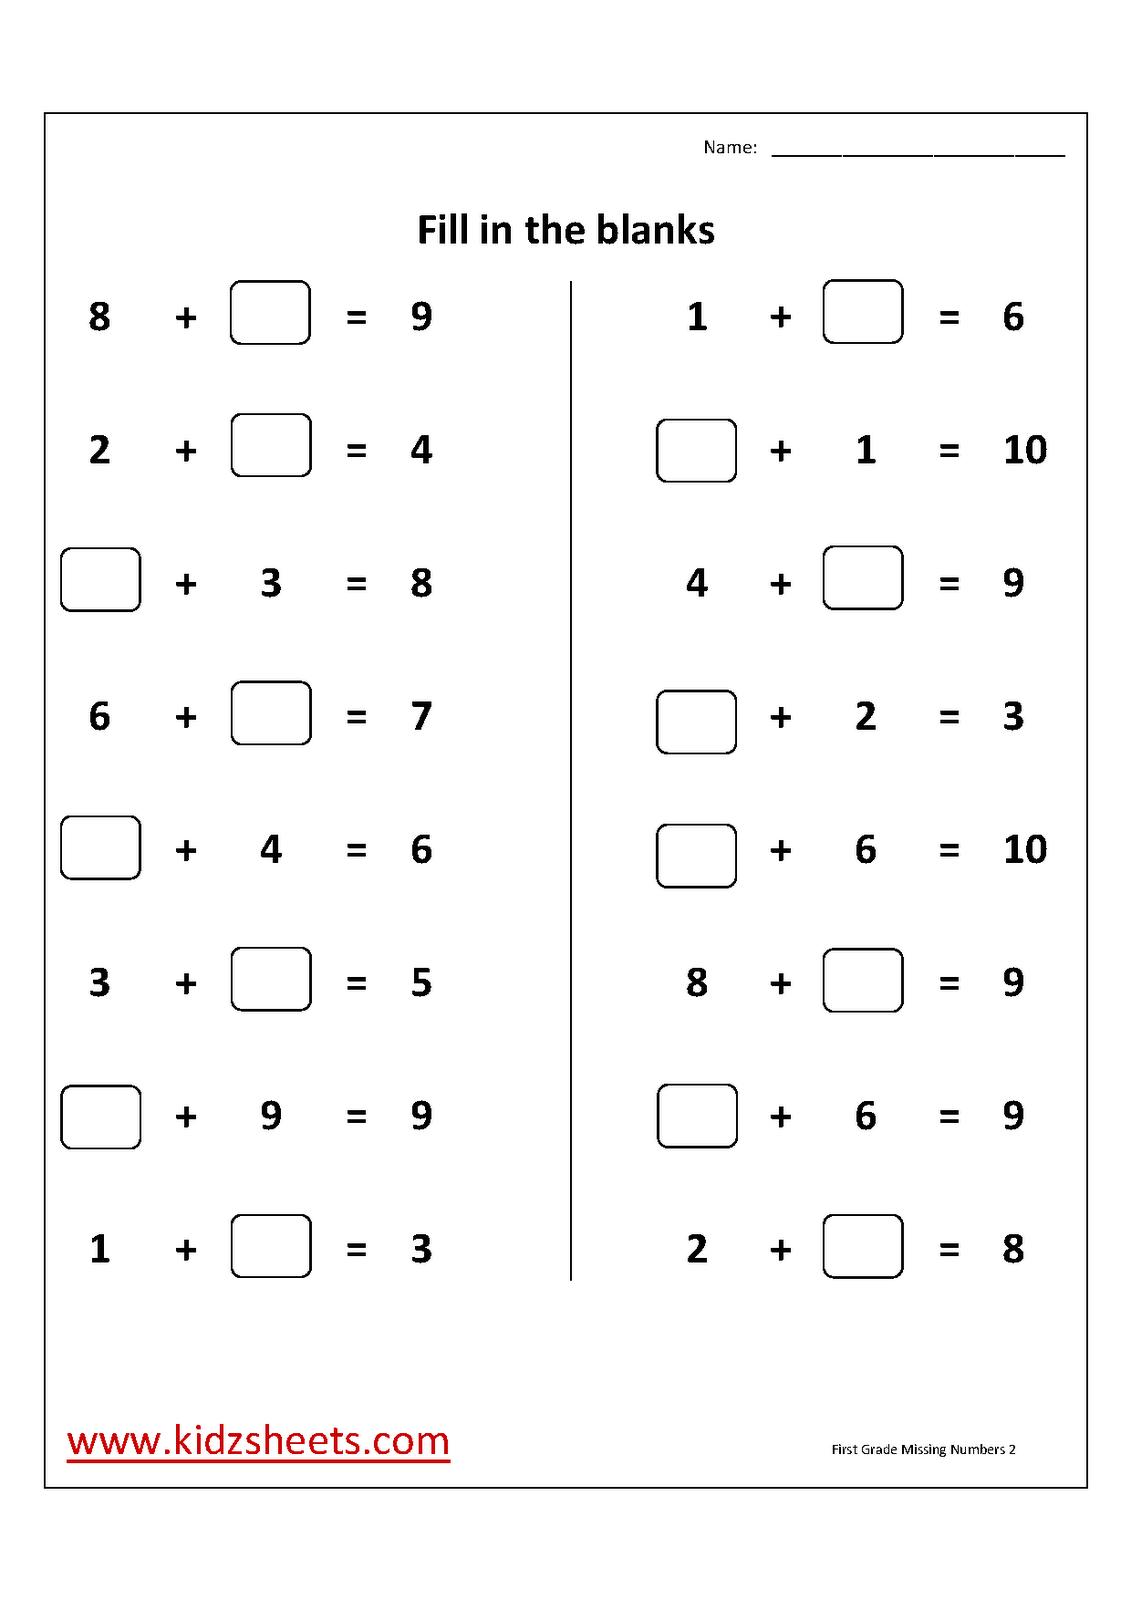 First Grade Missingadd Numbers Worksheet